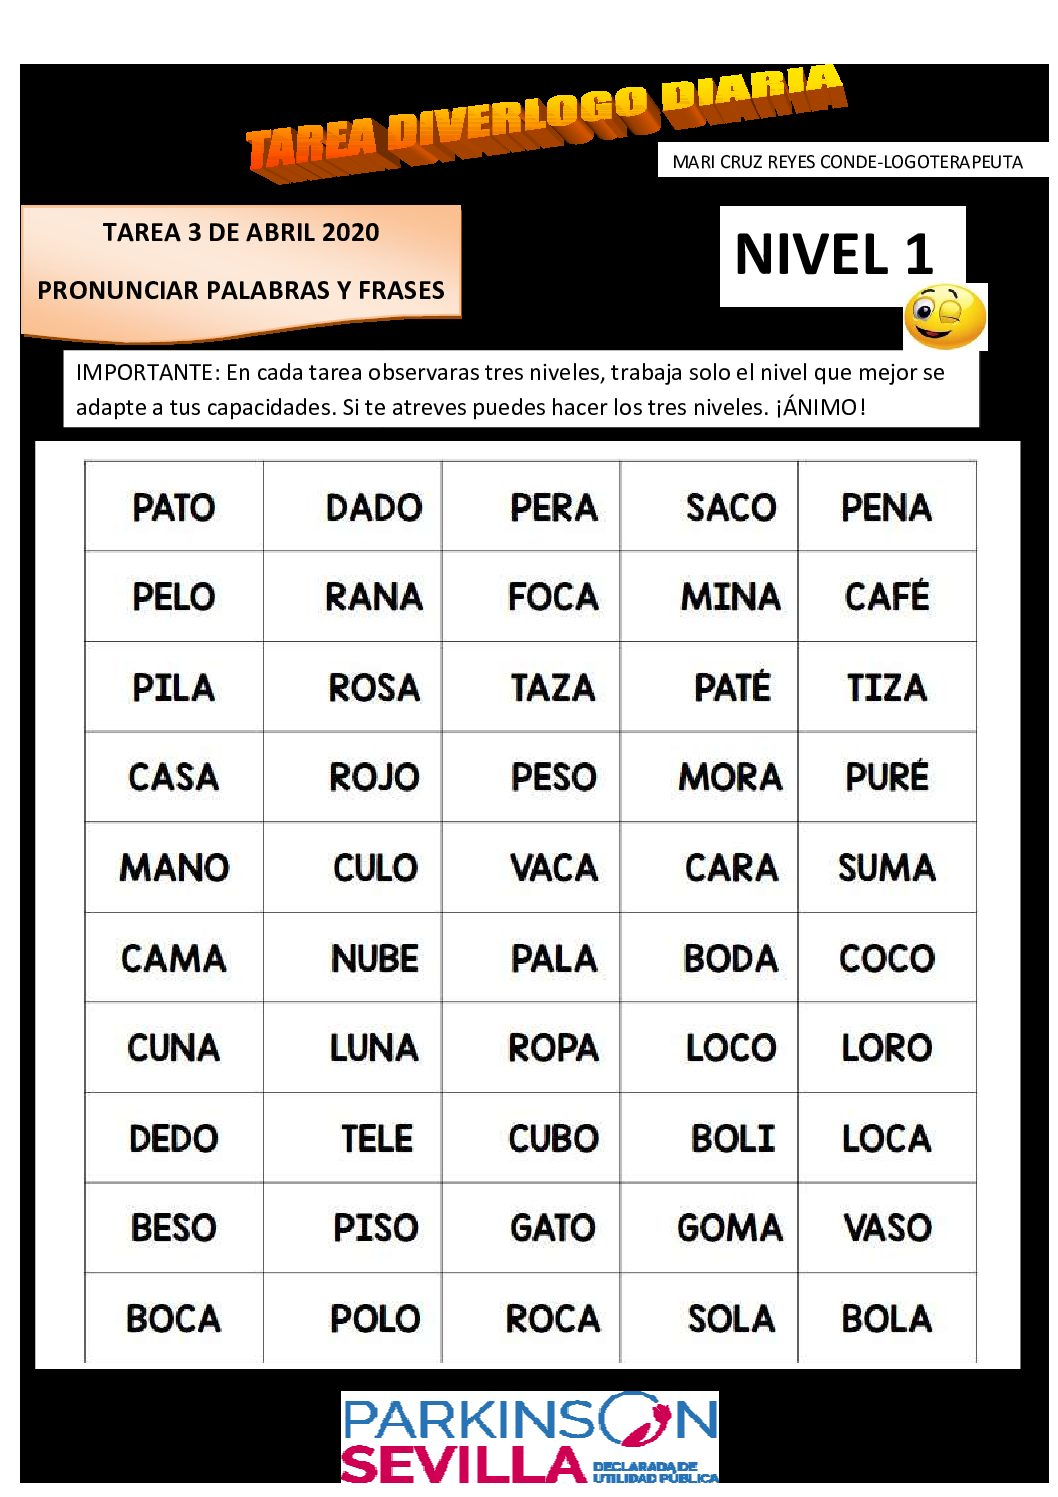 TAREA-6-DE-ABRIL-LOGO-pdf[1]